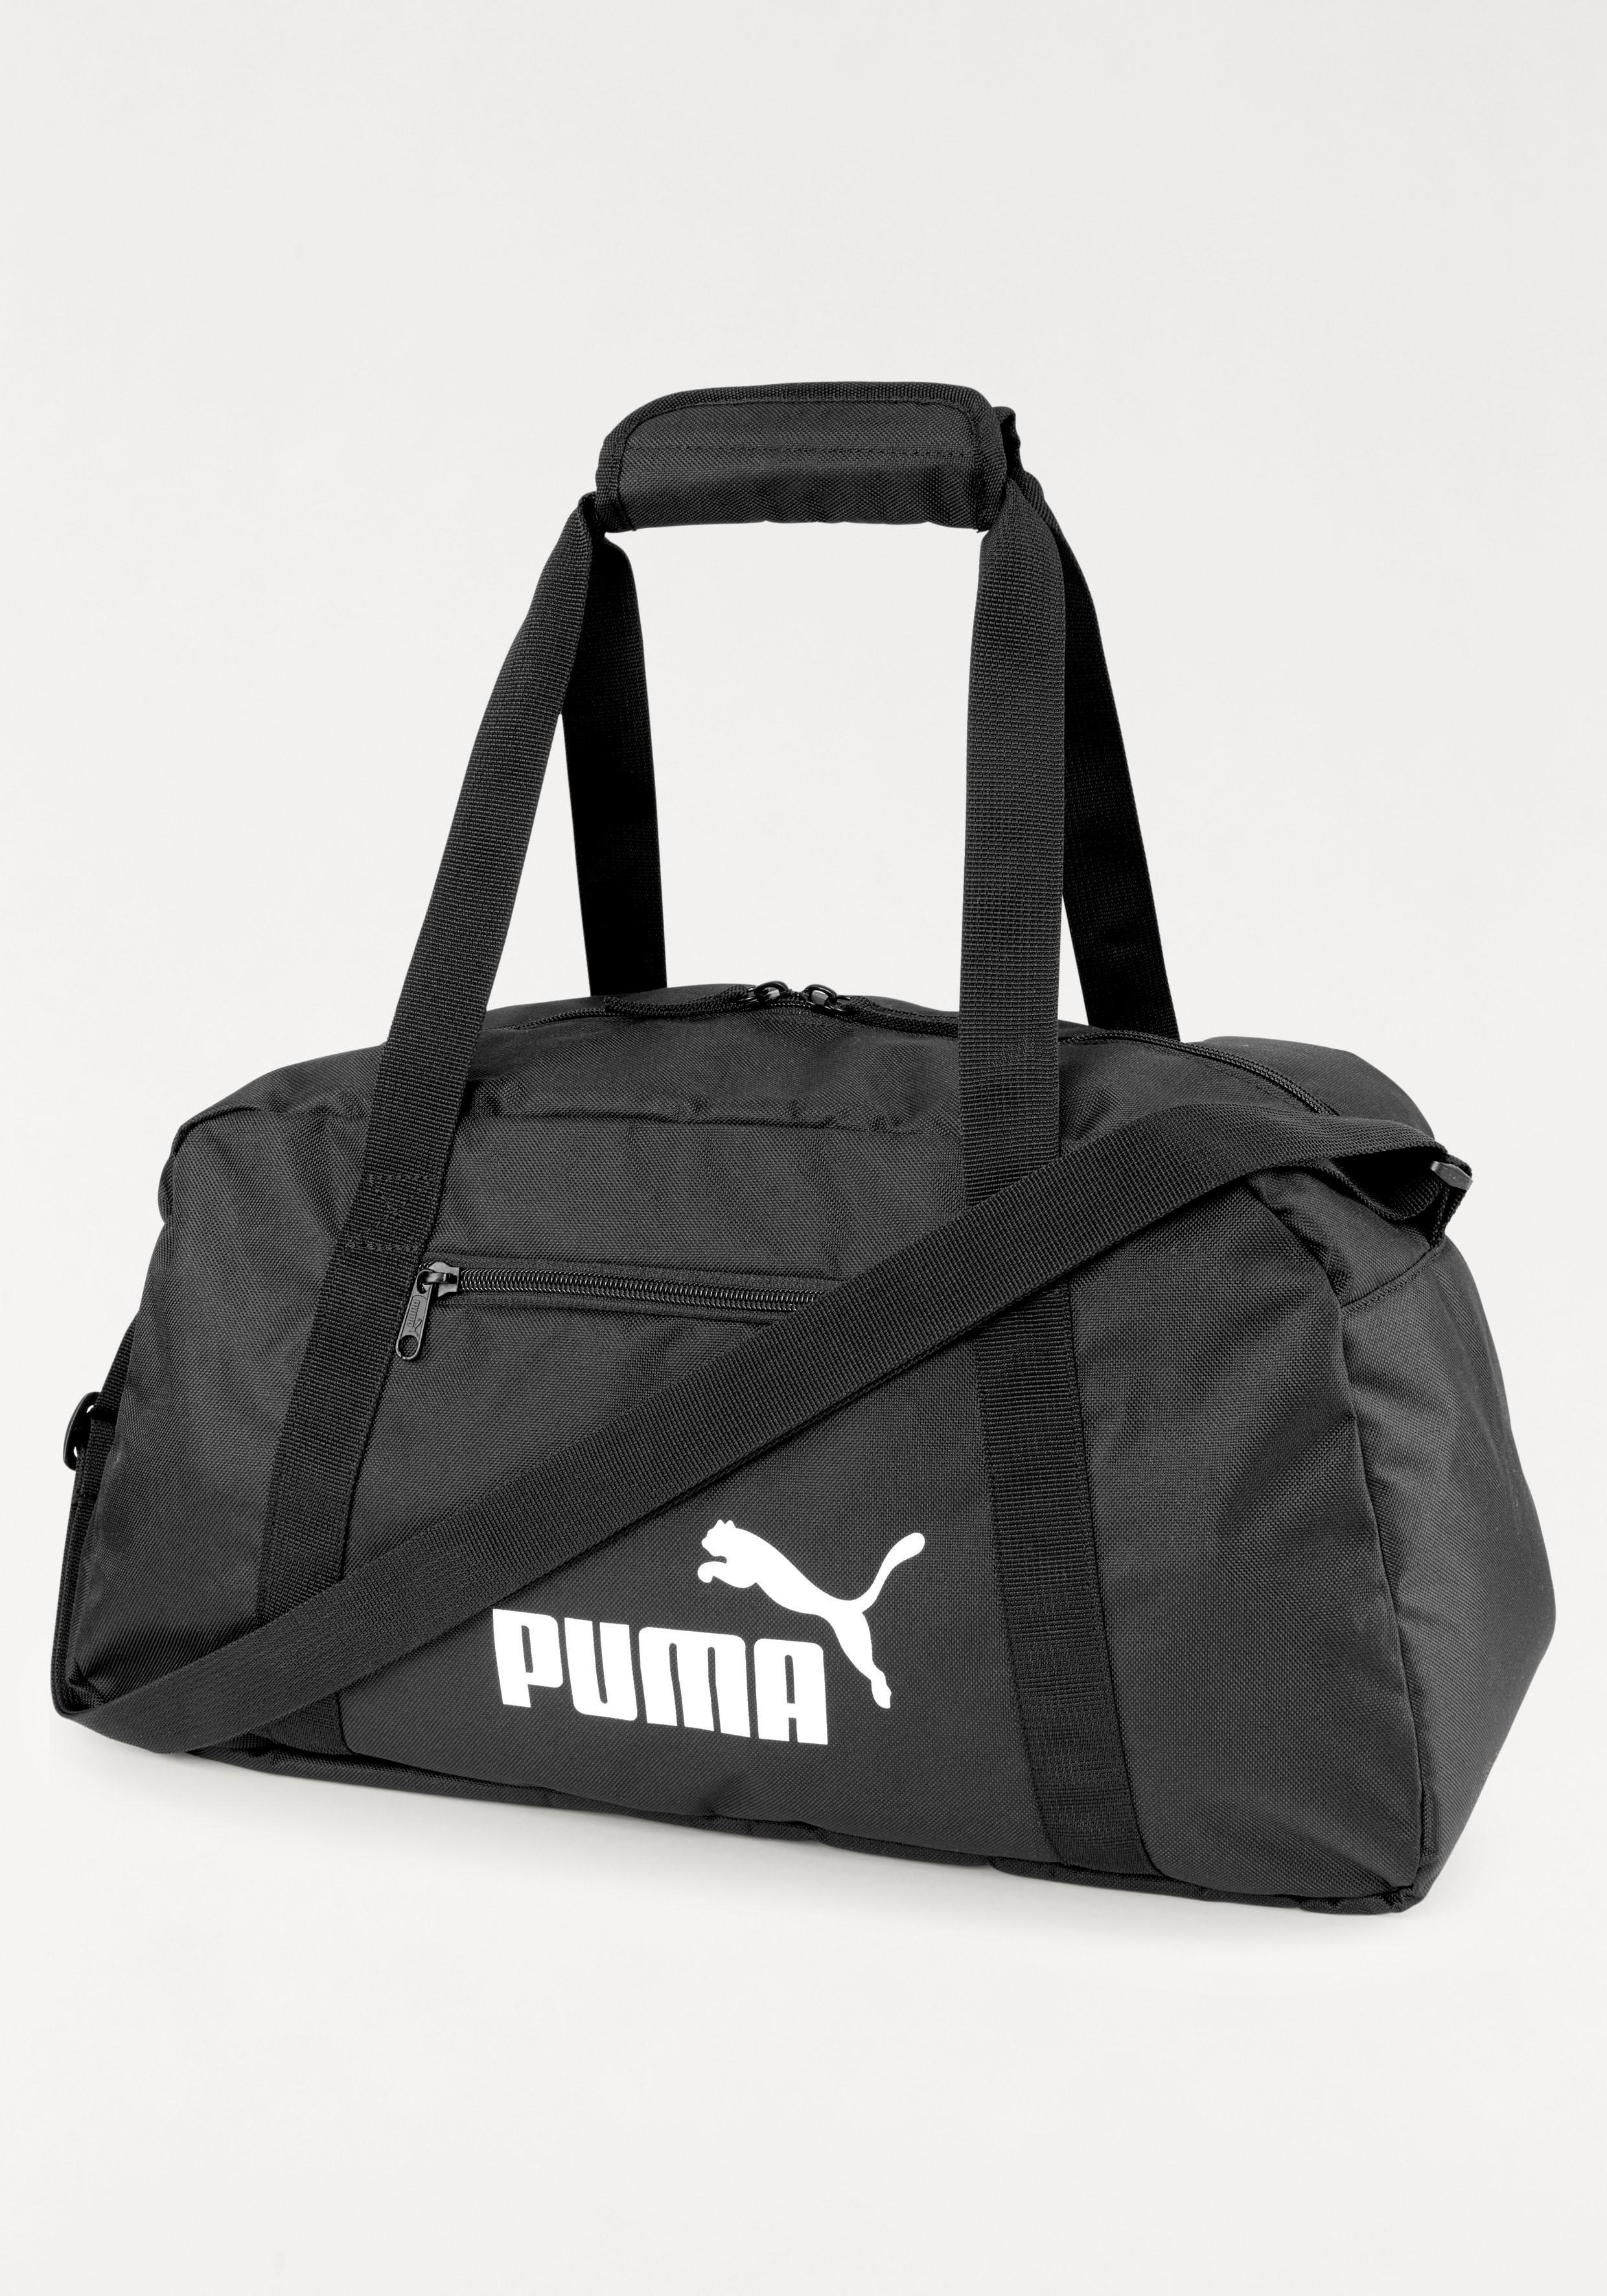 Puma sporttas »PHASE SPORTS BAG« goedkoop op otto.nl kopen